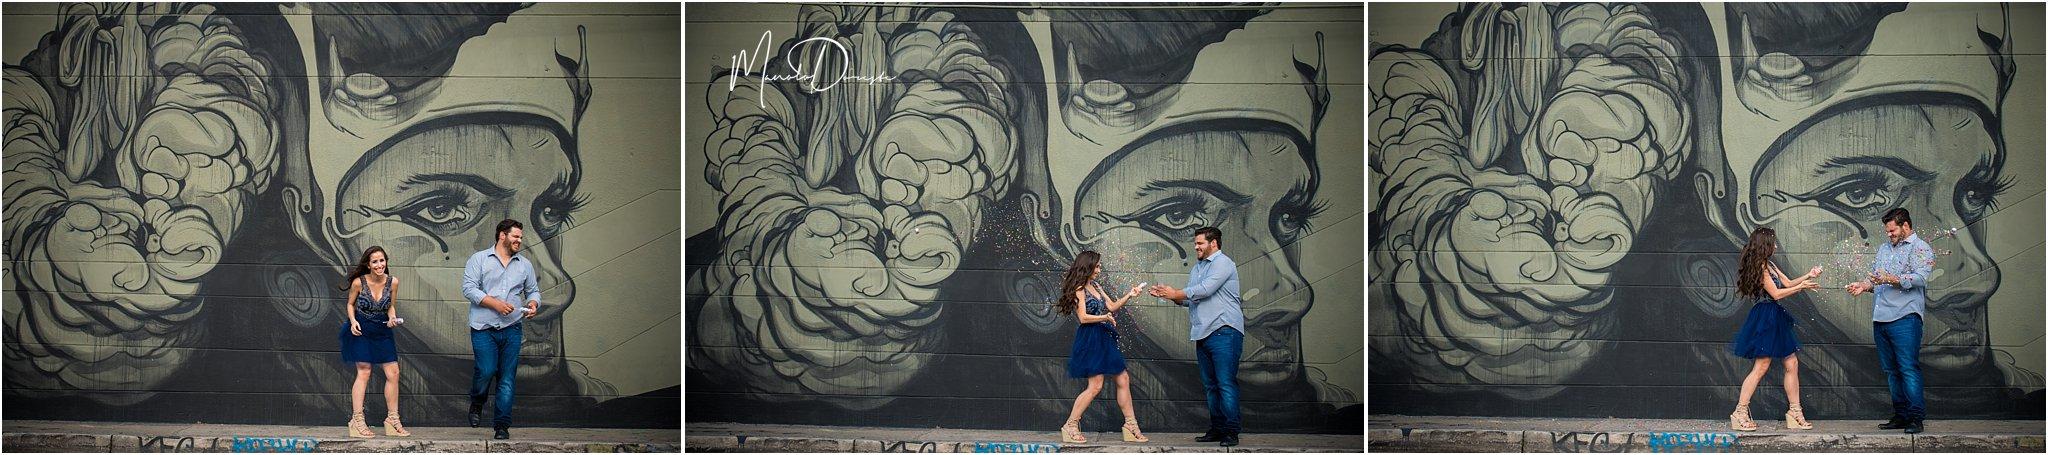 0606_ManoloDoreste_InFocusStudios_Wedding_Family_Photography_Miami_MiamiPhotographer.jpg